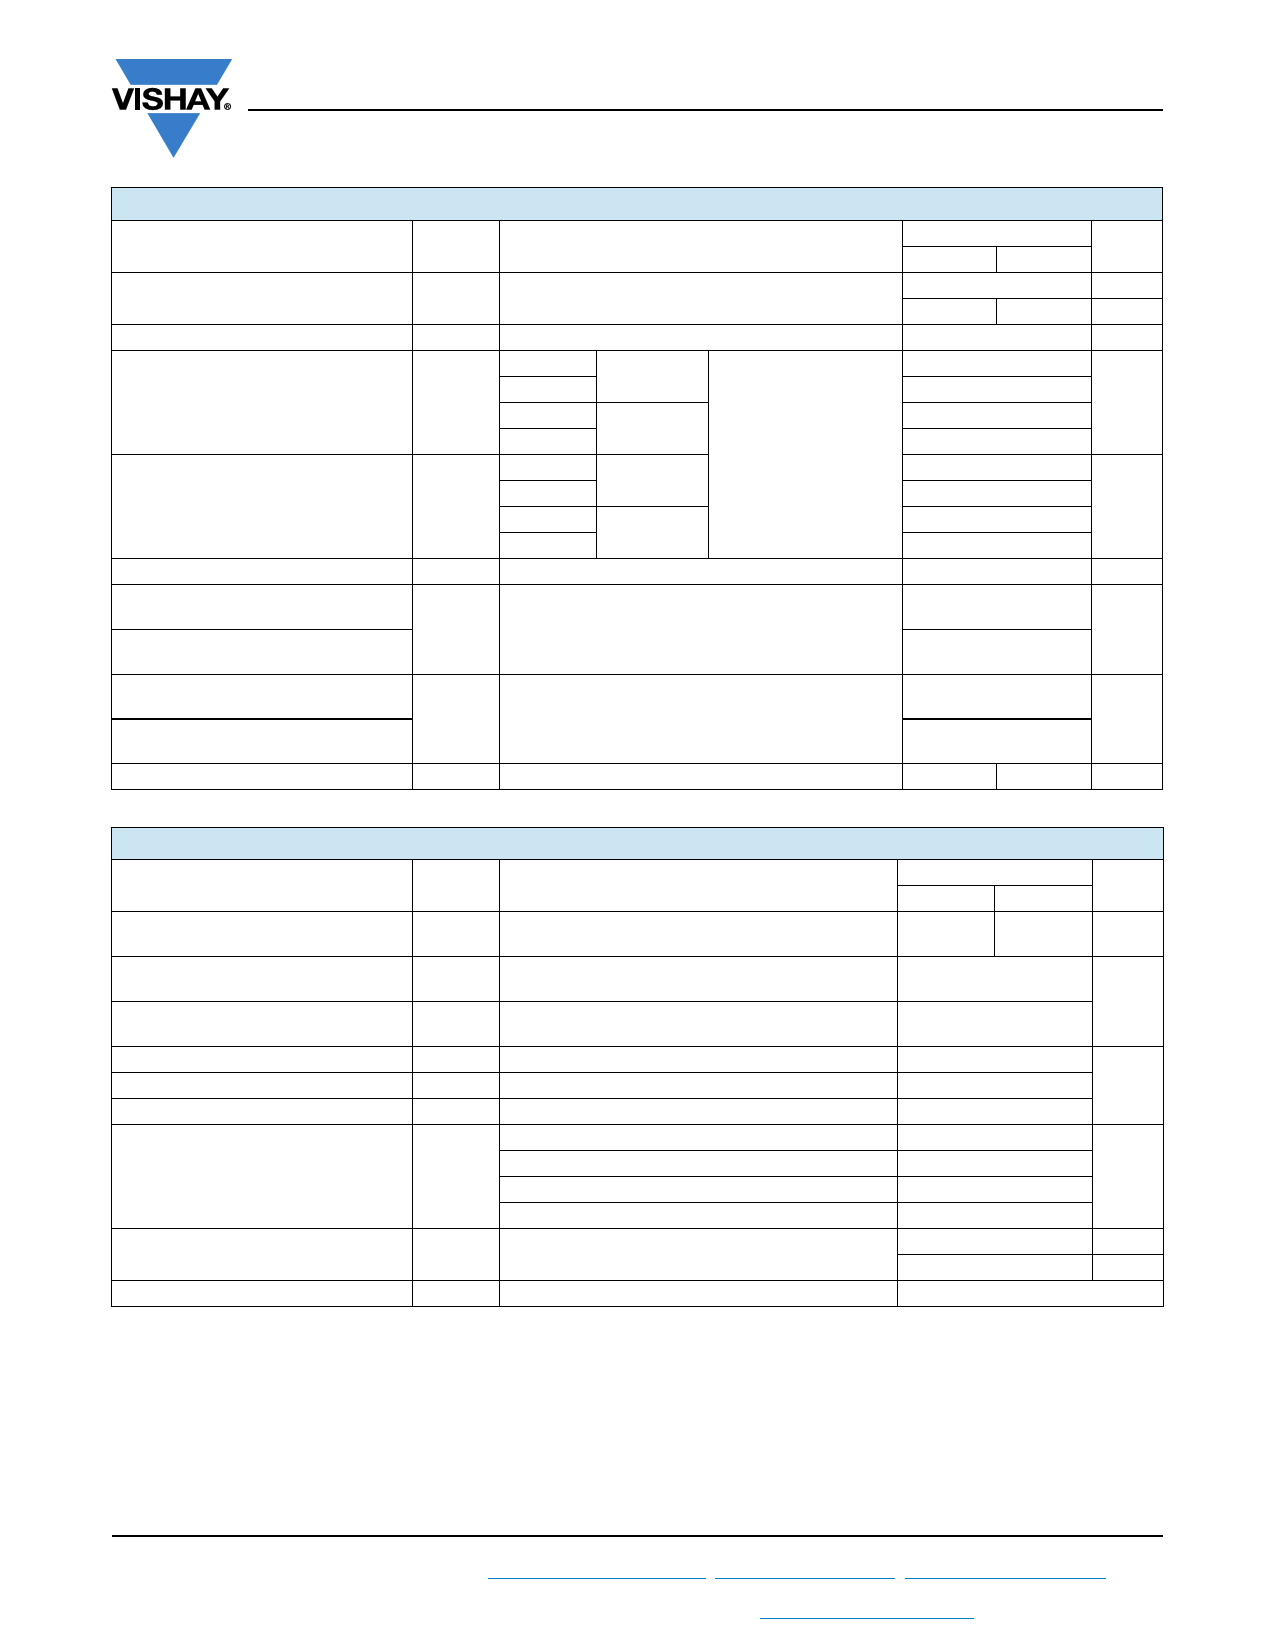 VS-88HF160 pdf